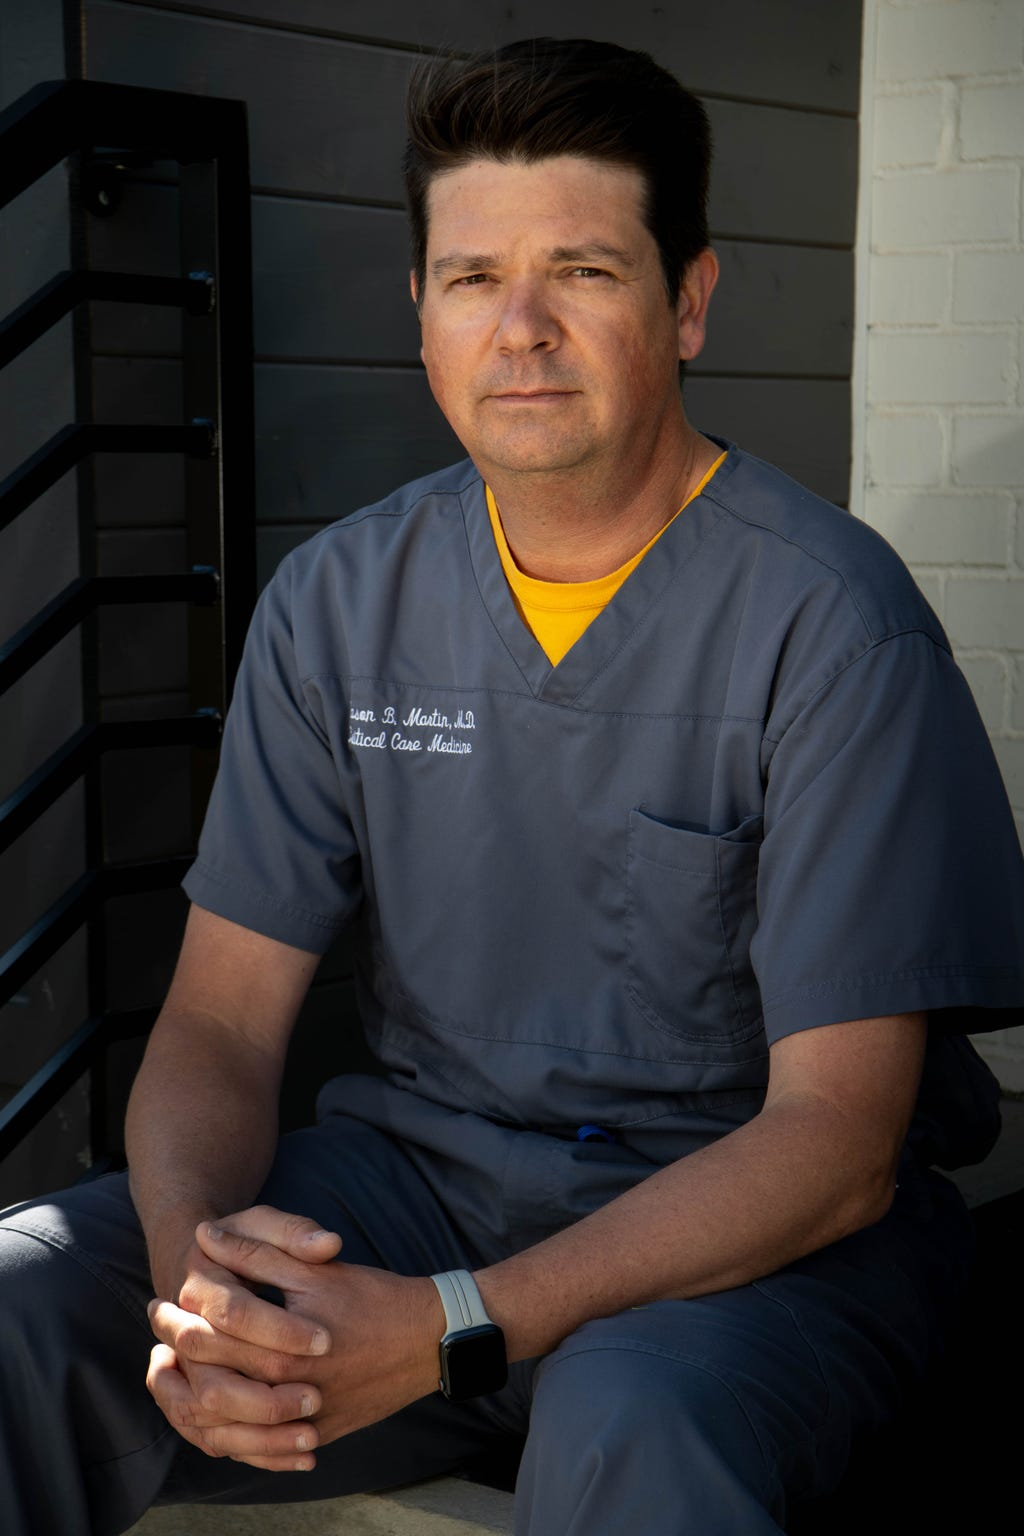 Dr. Jason Martin of Sumner Regional Medical Center poses for a portrait at his home Thursday, April 9, 2020, in Nashville, Tenn.